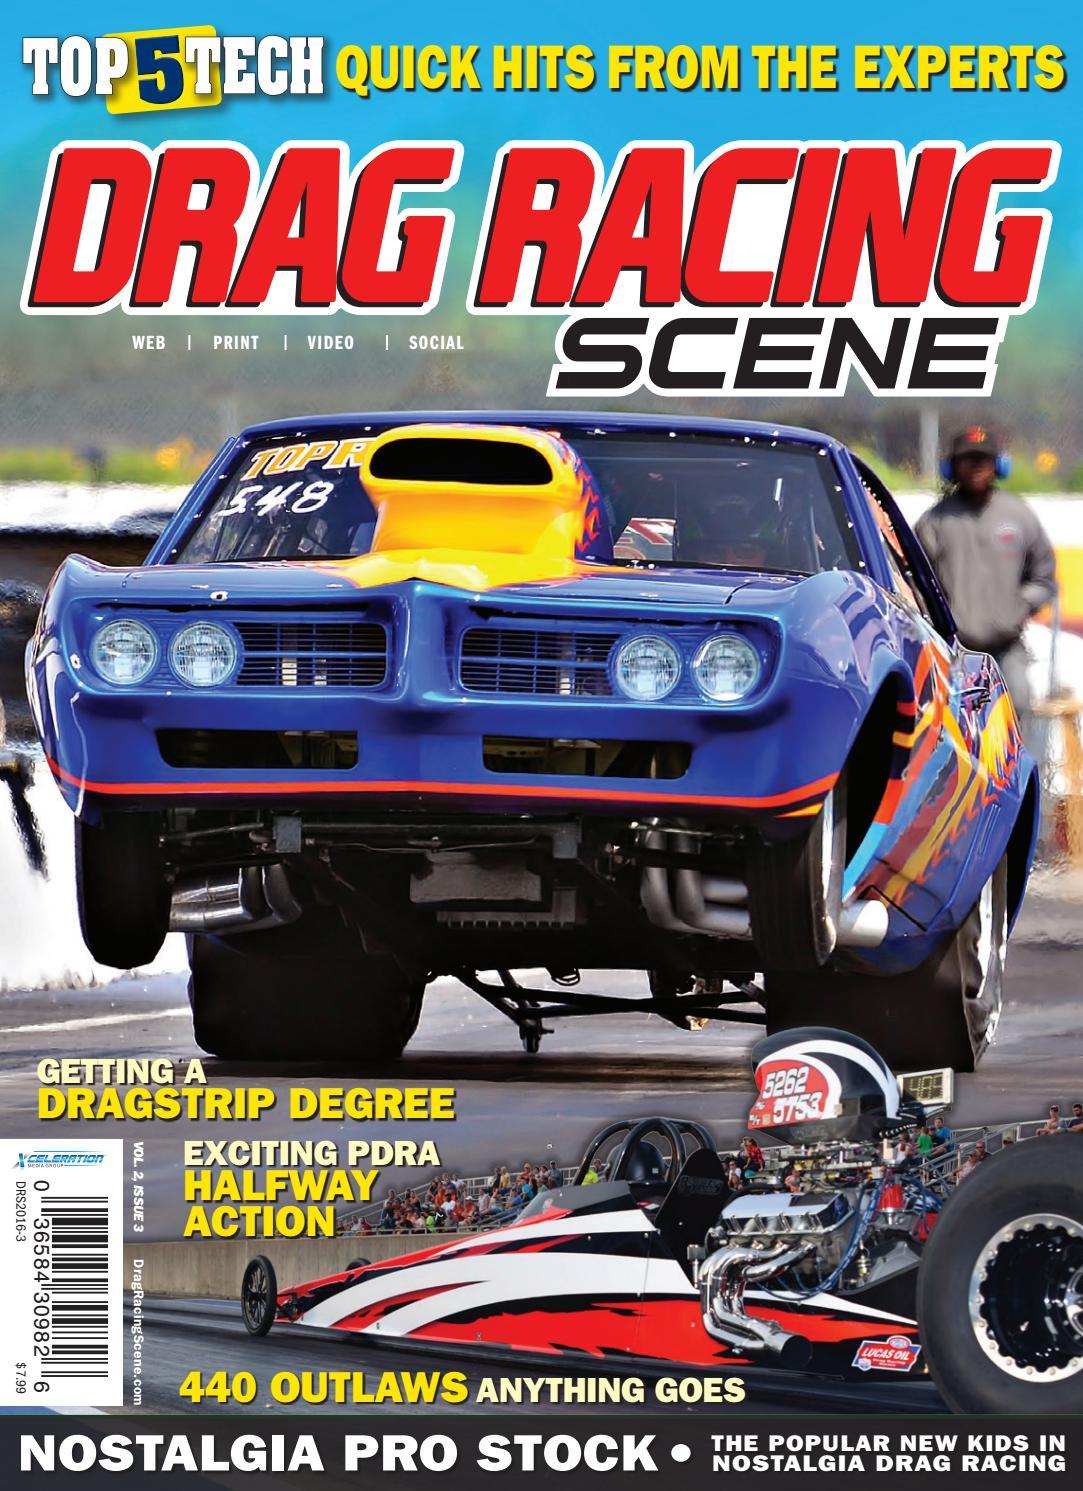 Drag Racing Scene Fall 2016 by Xceleration Media - issuu